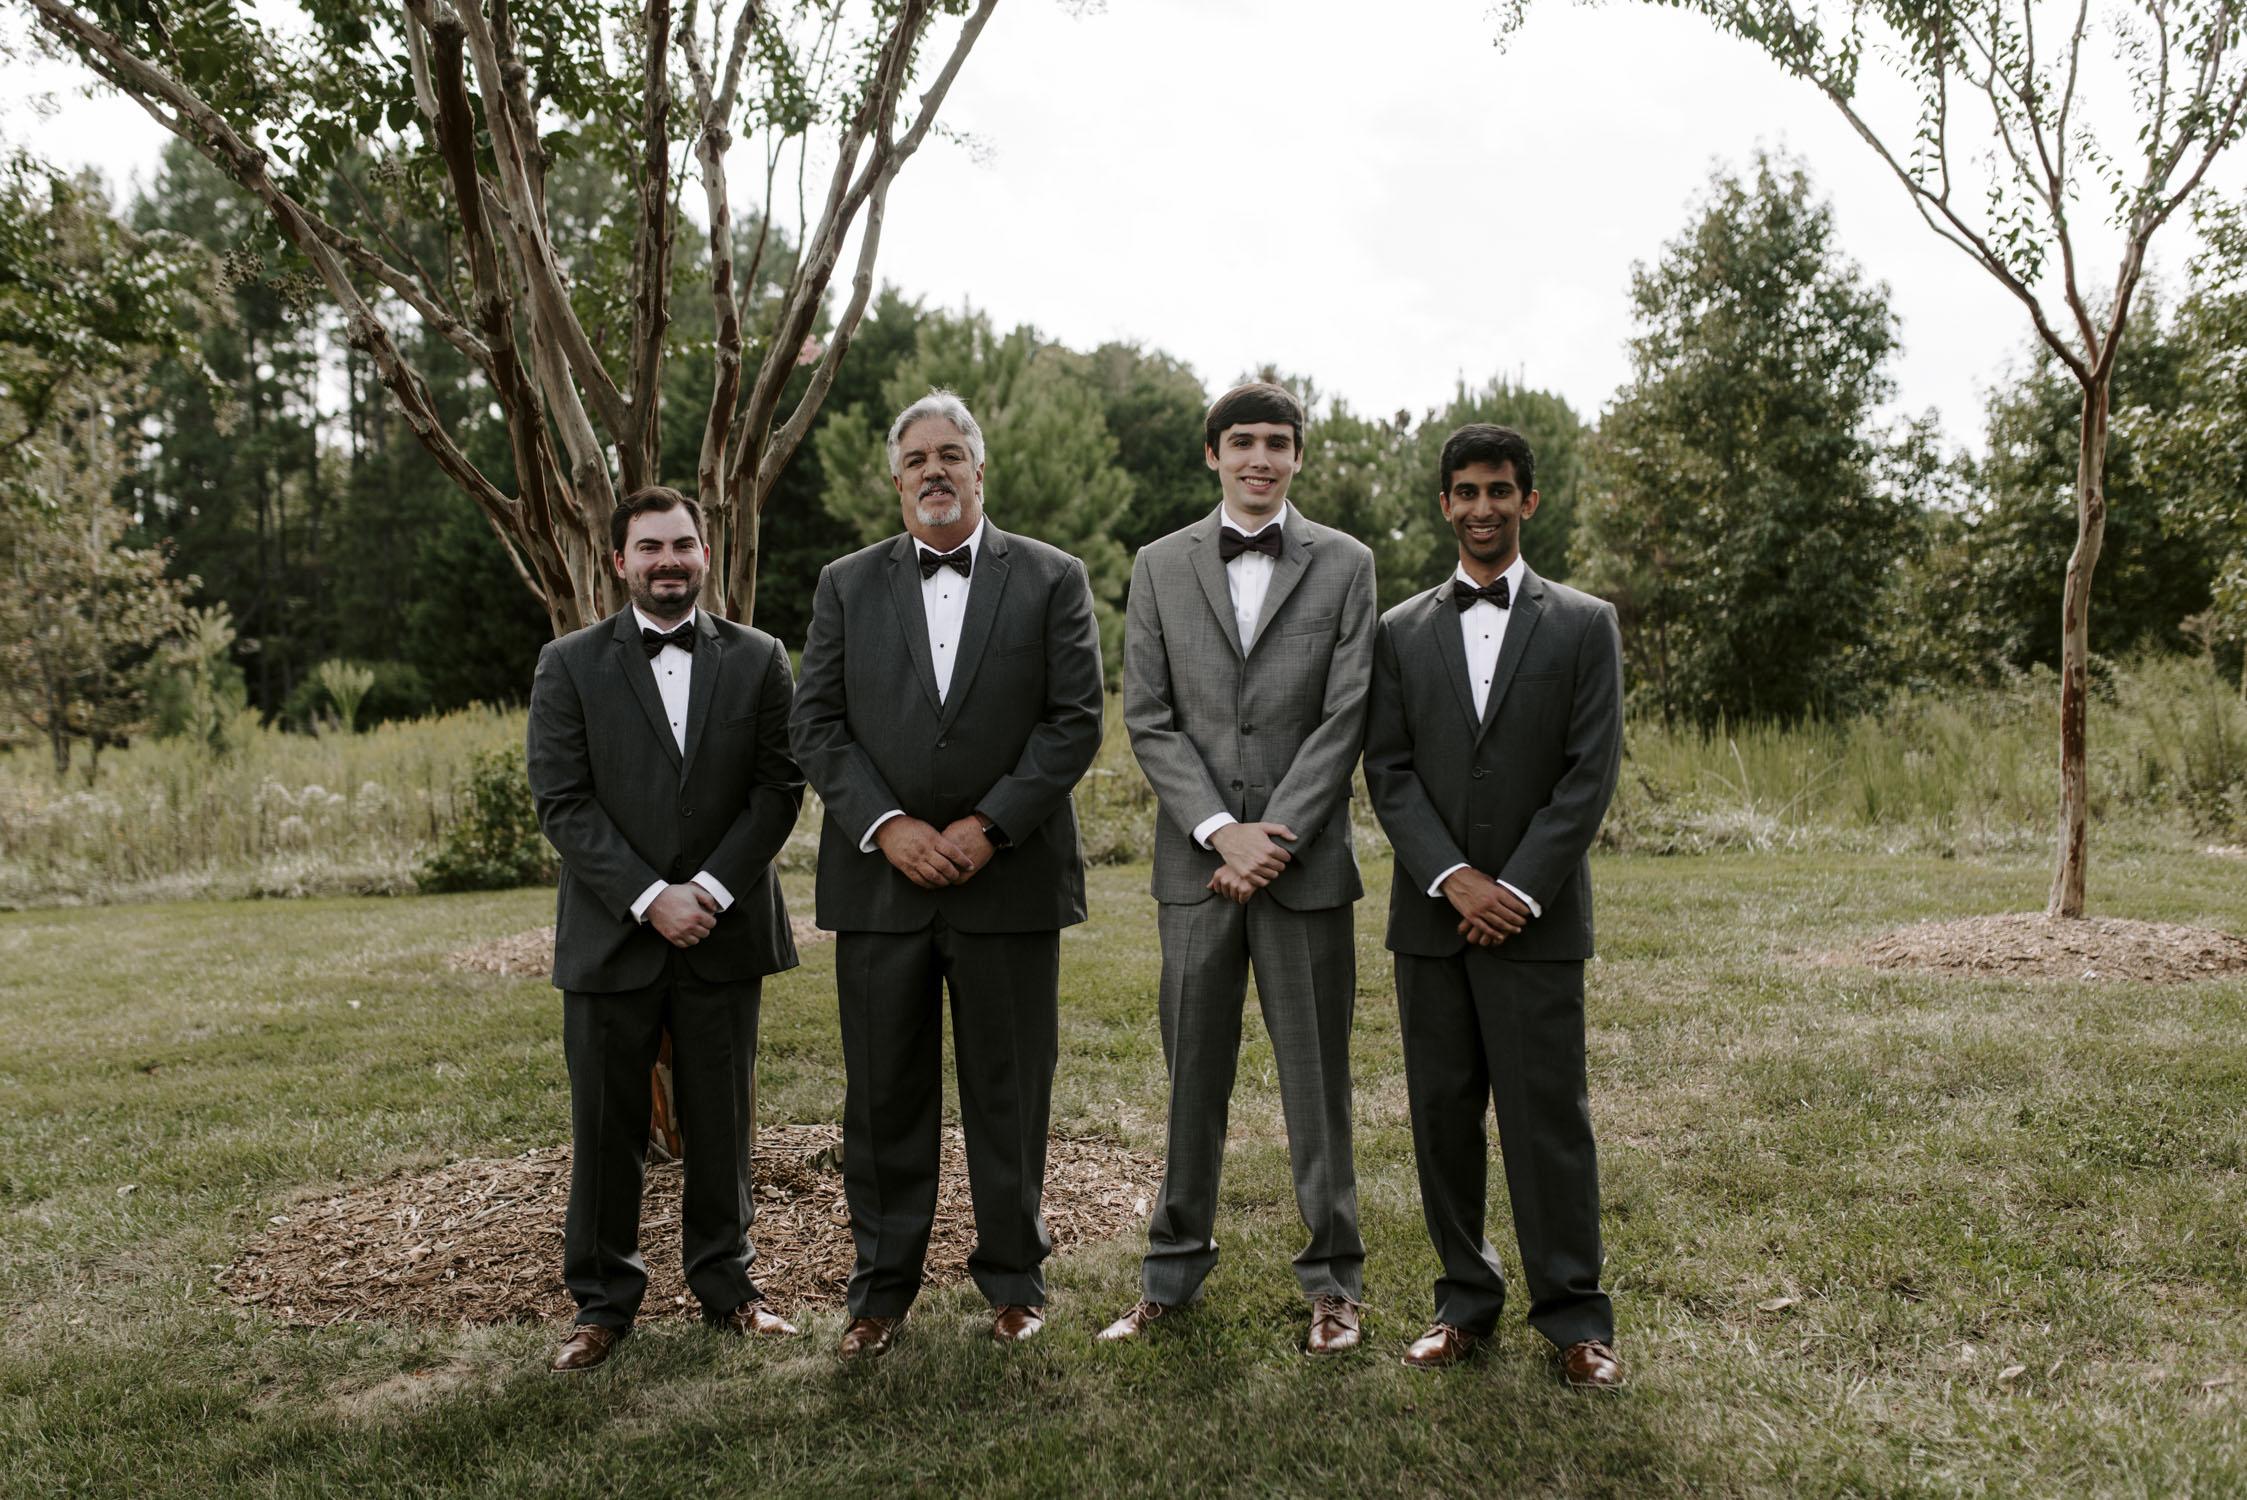 Chapel Hill Wedding Party Groomsmen Portraits | Kayli LaFon Photography, North Carolina Intimate Wedding Photographer